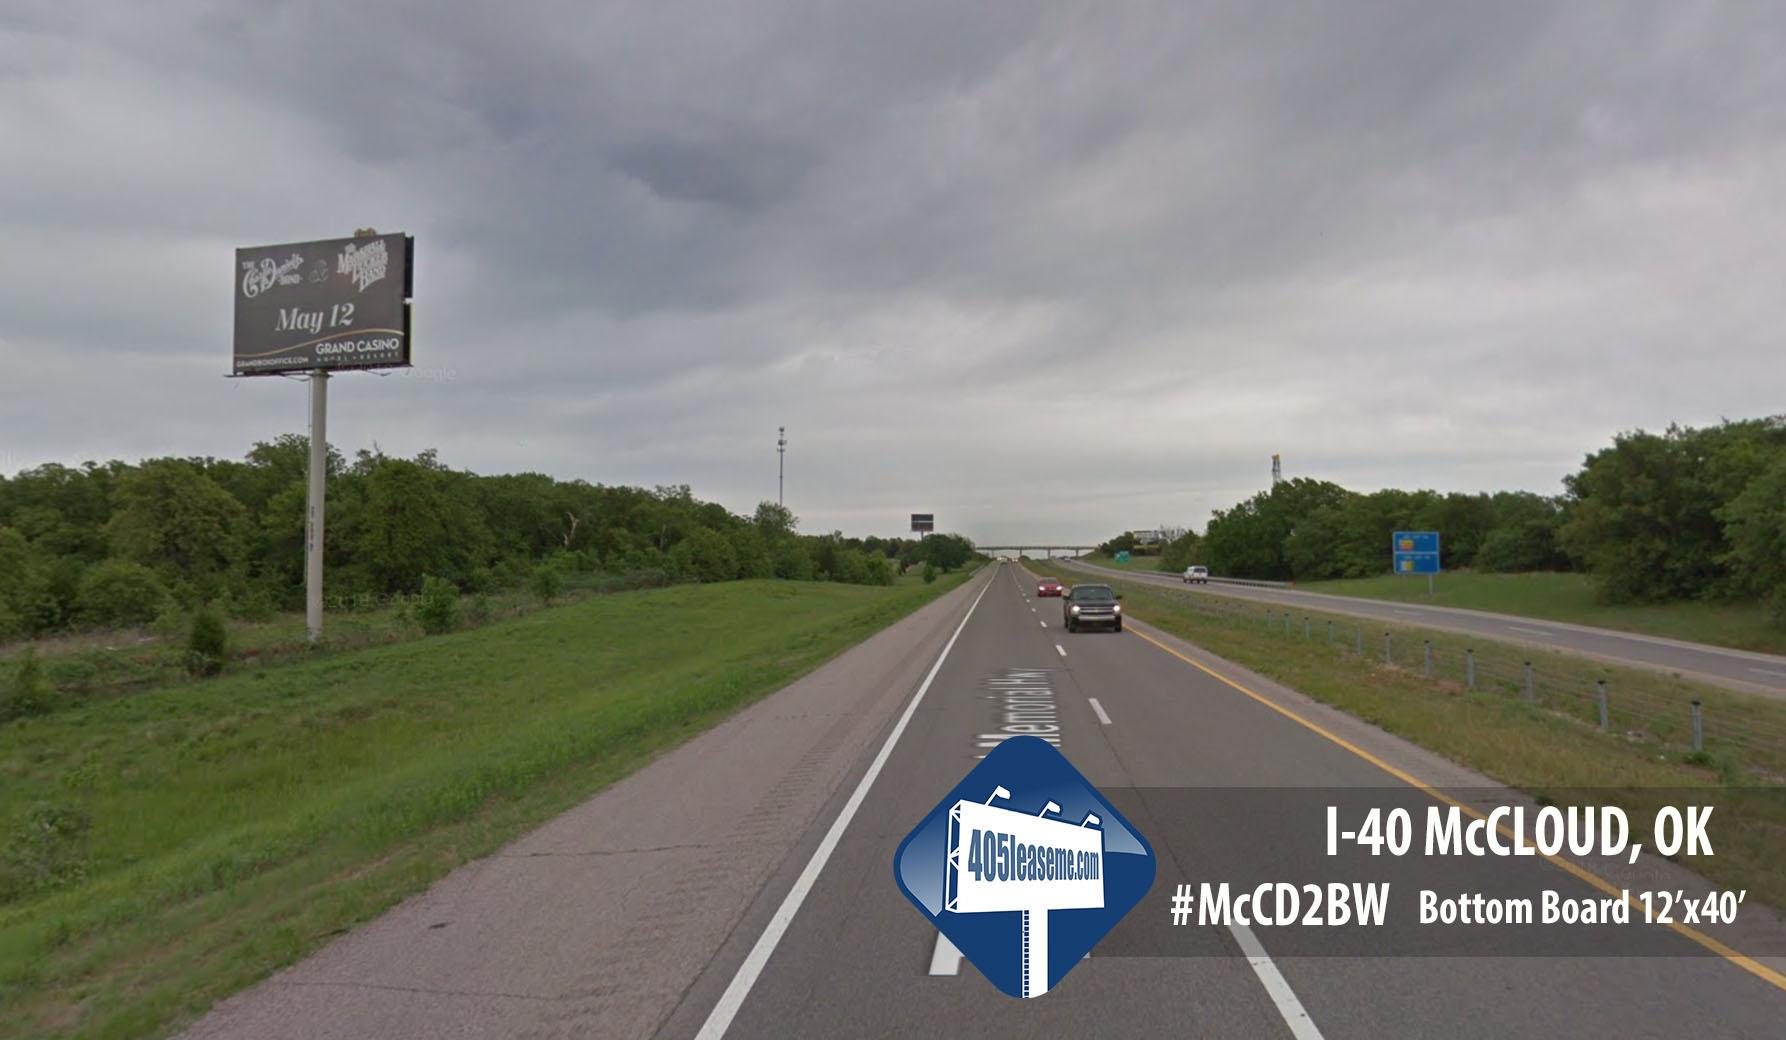 2 McCloud - McCD2BW